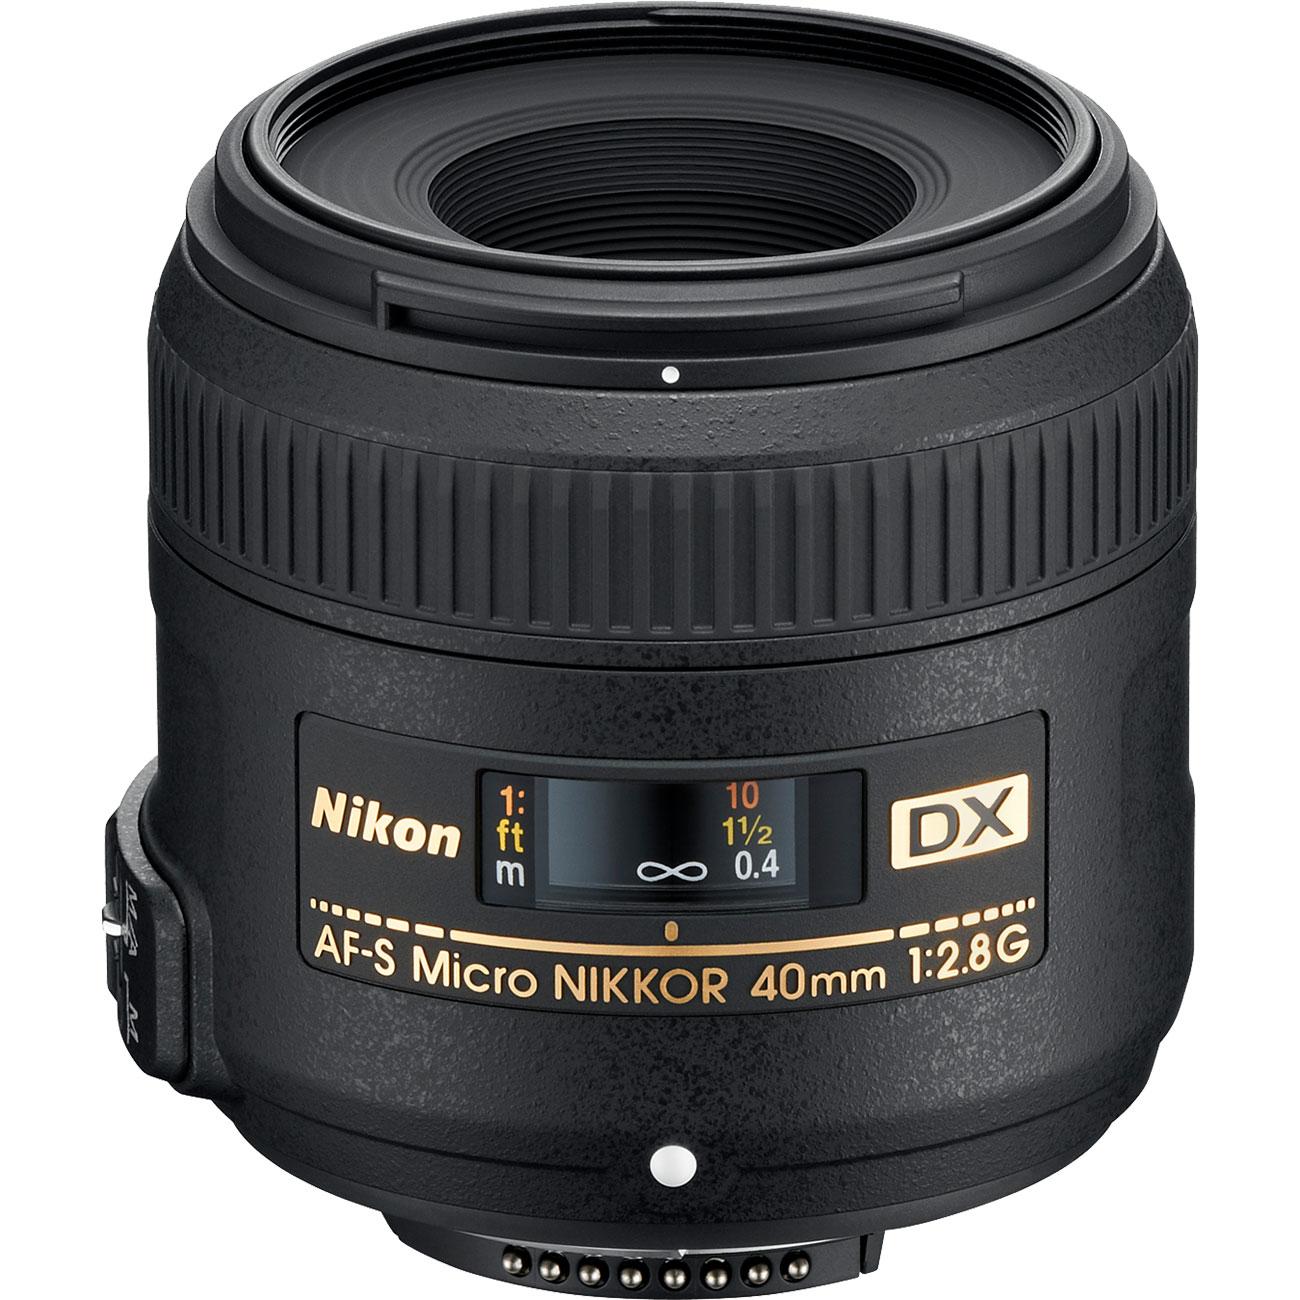 Nikon 40mm f/2.8 G DX AF-S Micro-Nikkor Lens - Factory Refurbished includes Full 1 Year Warranty